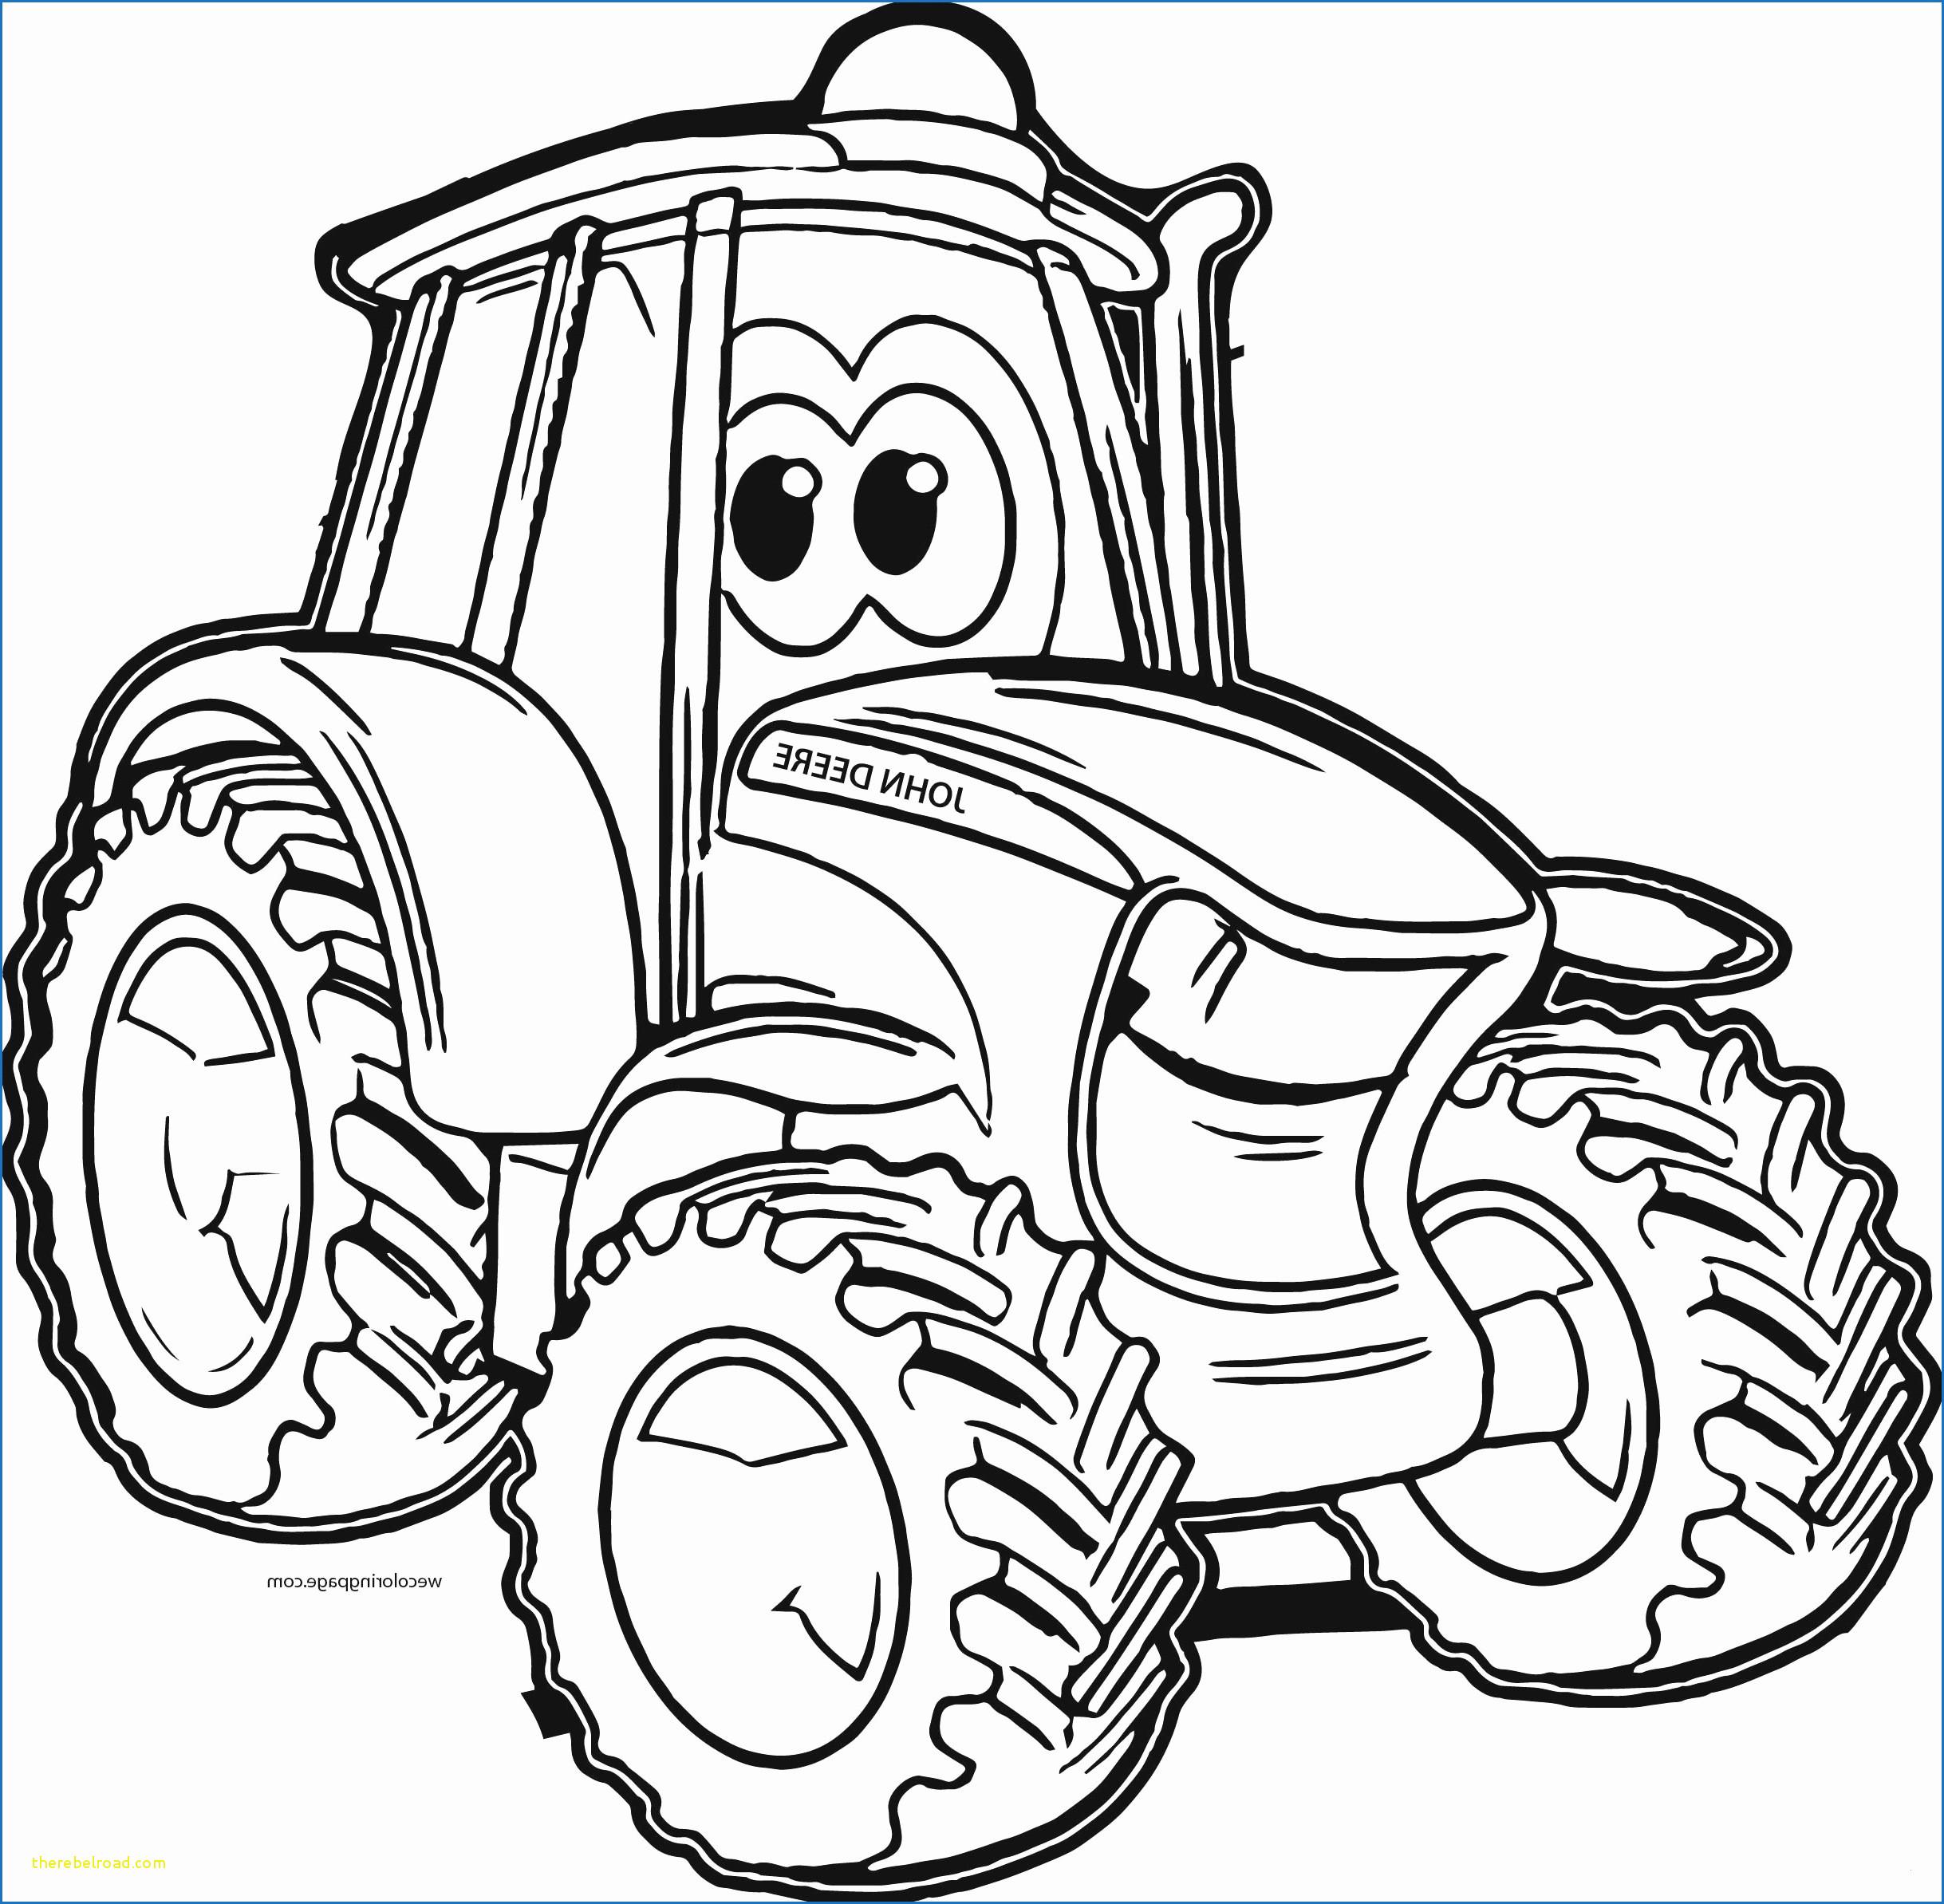 John Deere Ausmalbilder Frisch Ausmalbild Traktor Sammlung